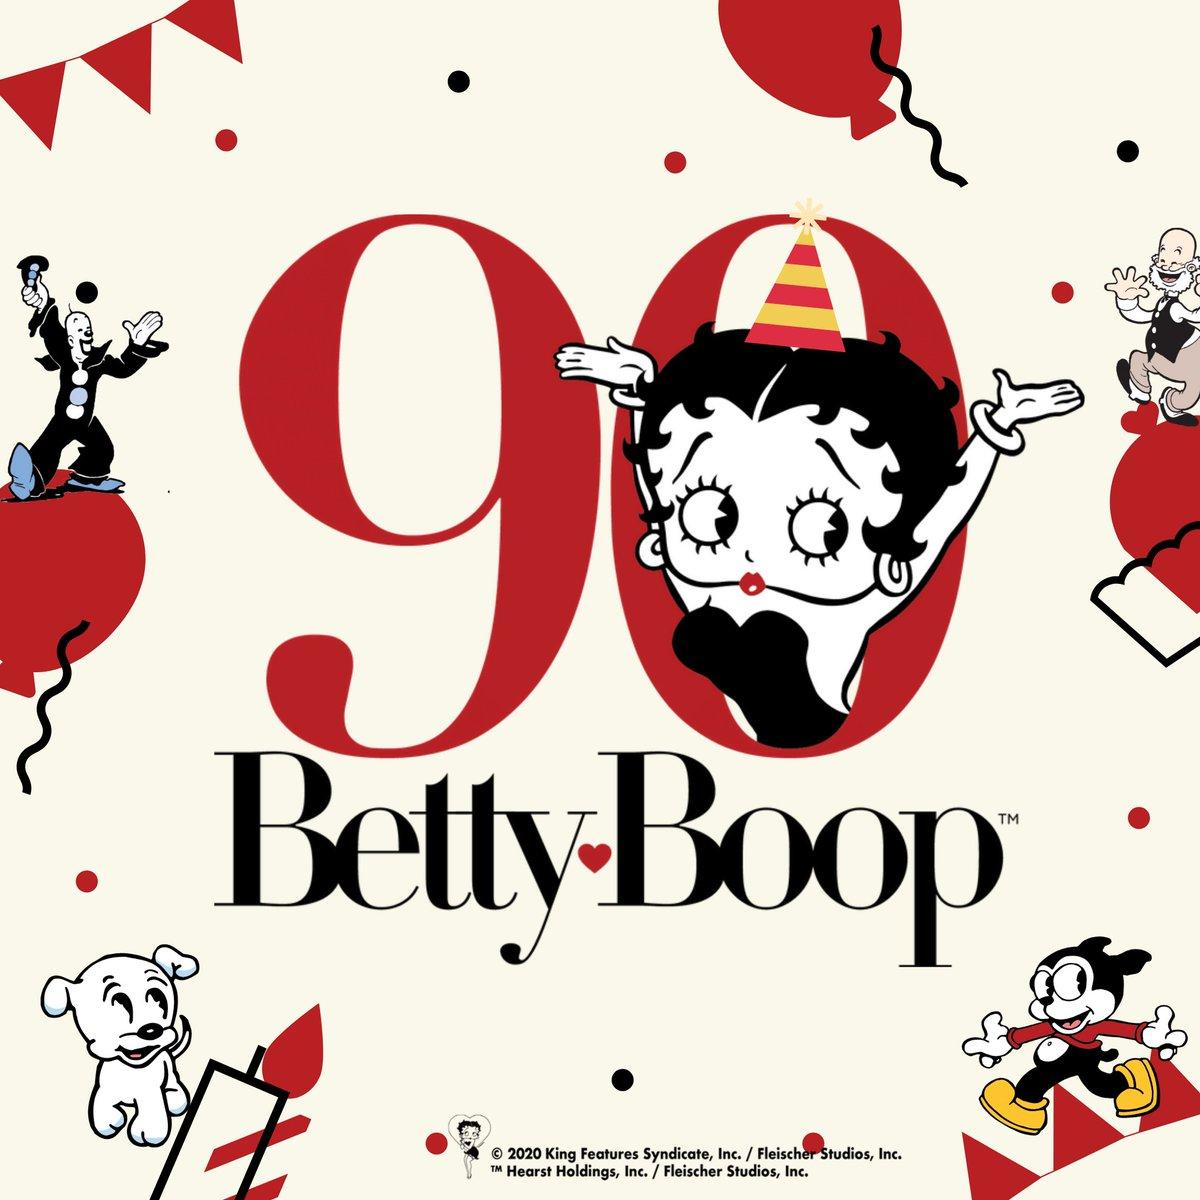 Betty Boop Bettyboopnews Twitter